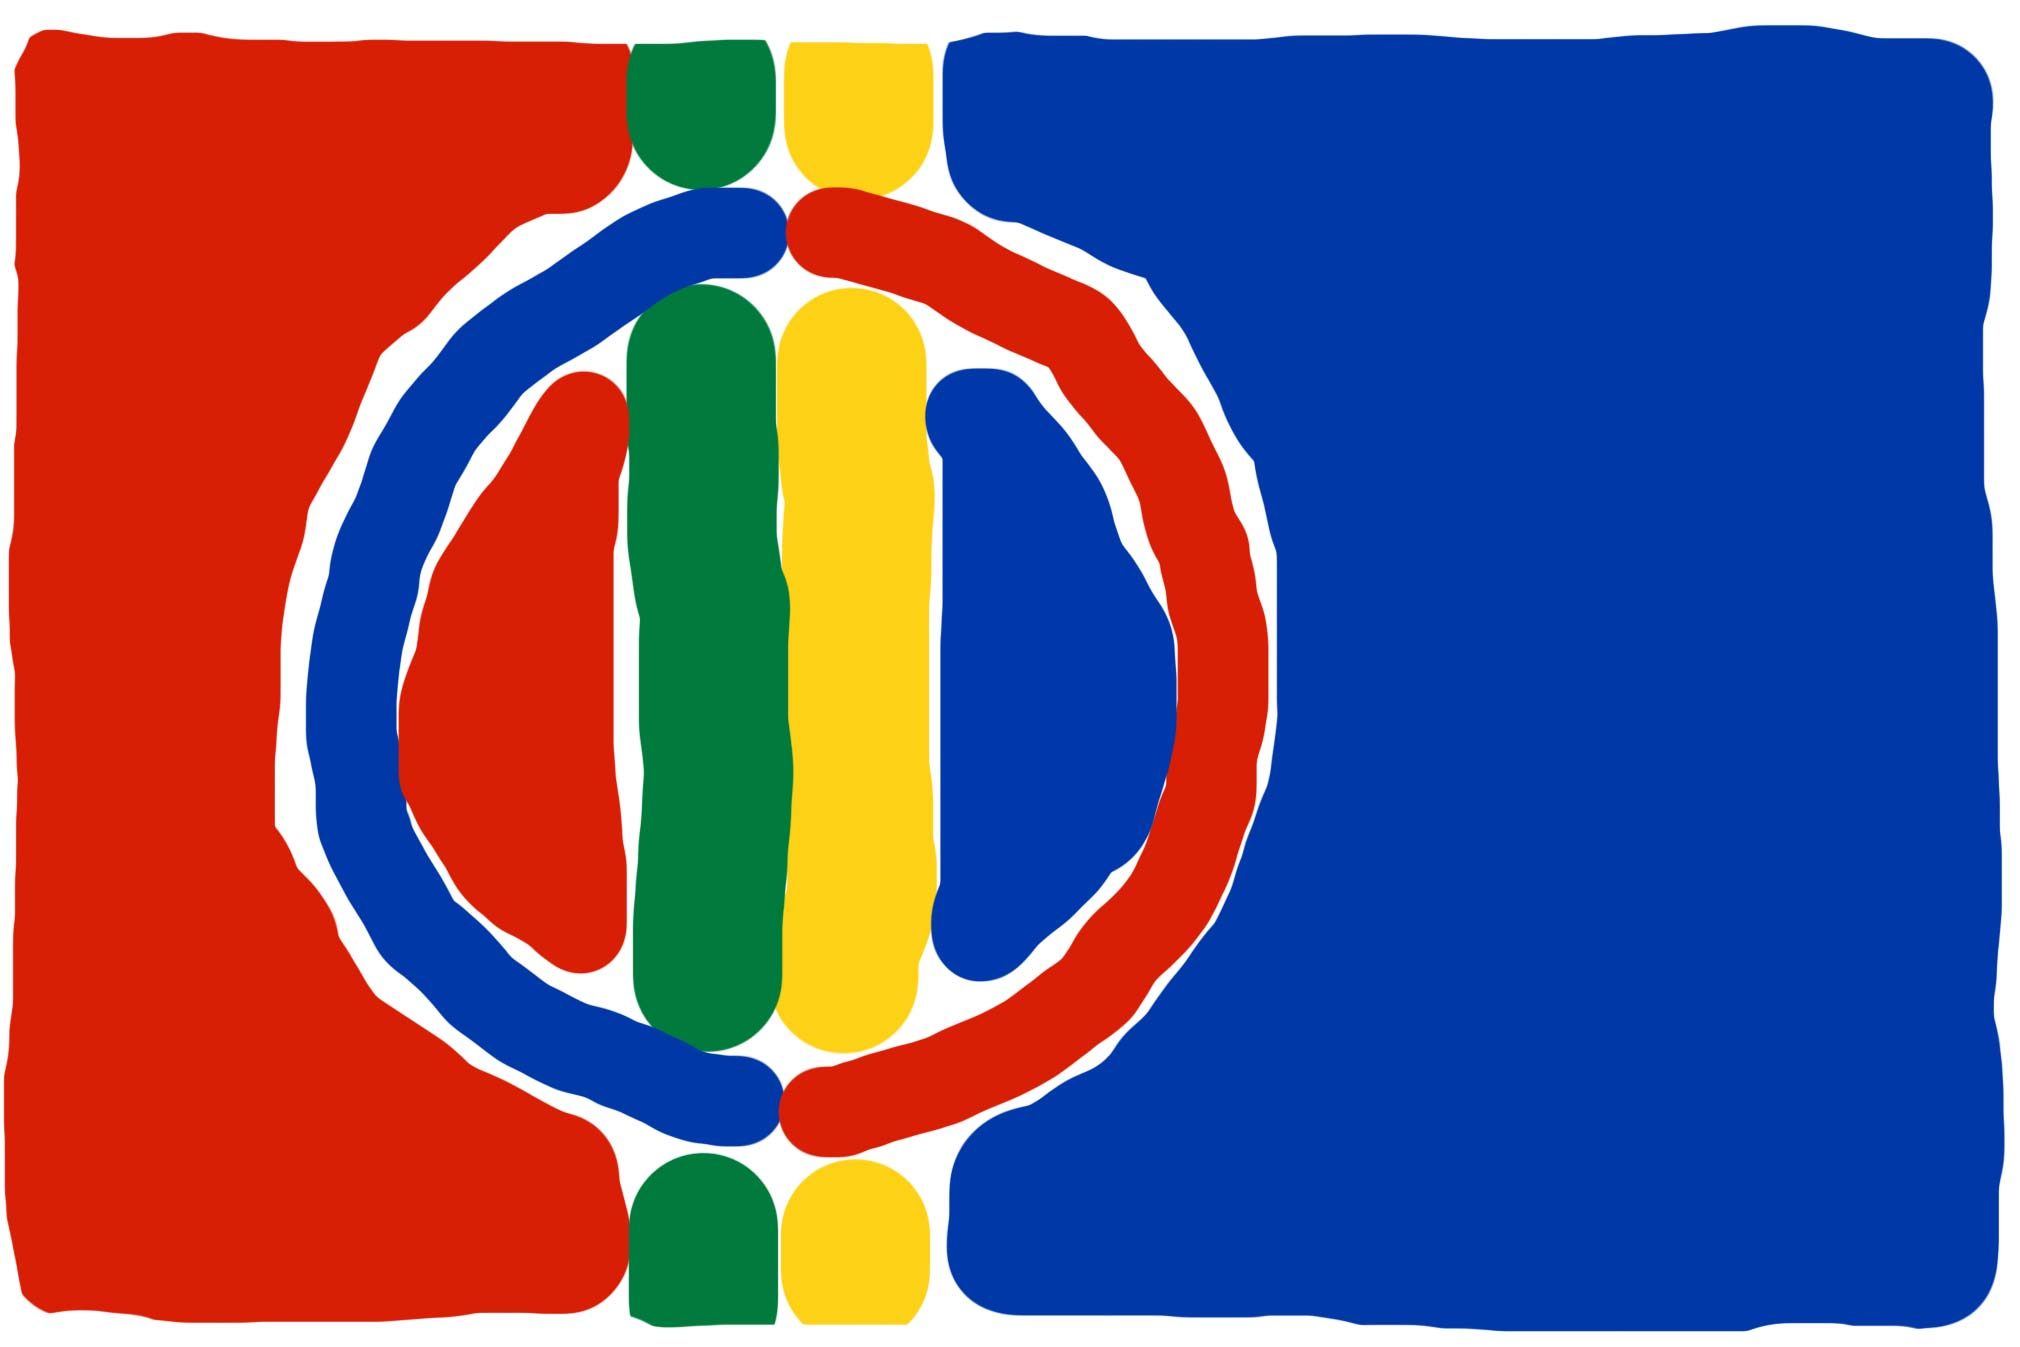 drawnflag.jpg